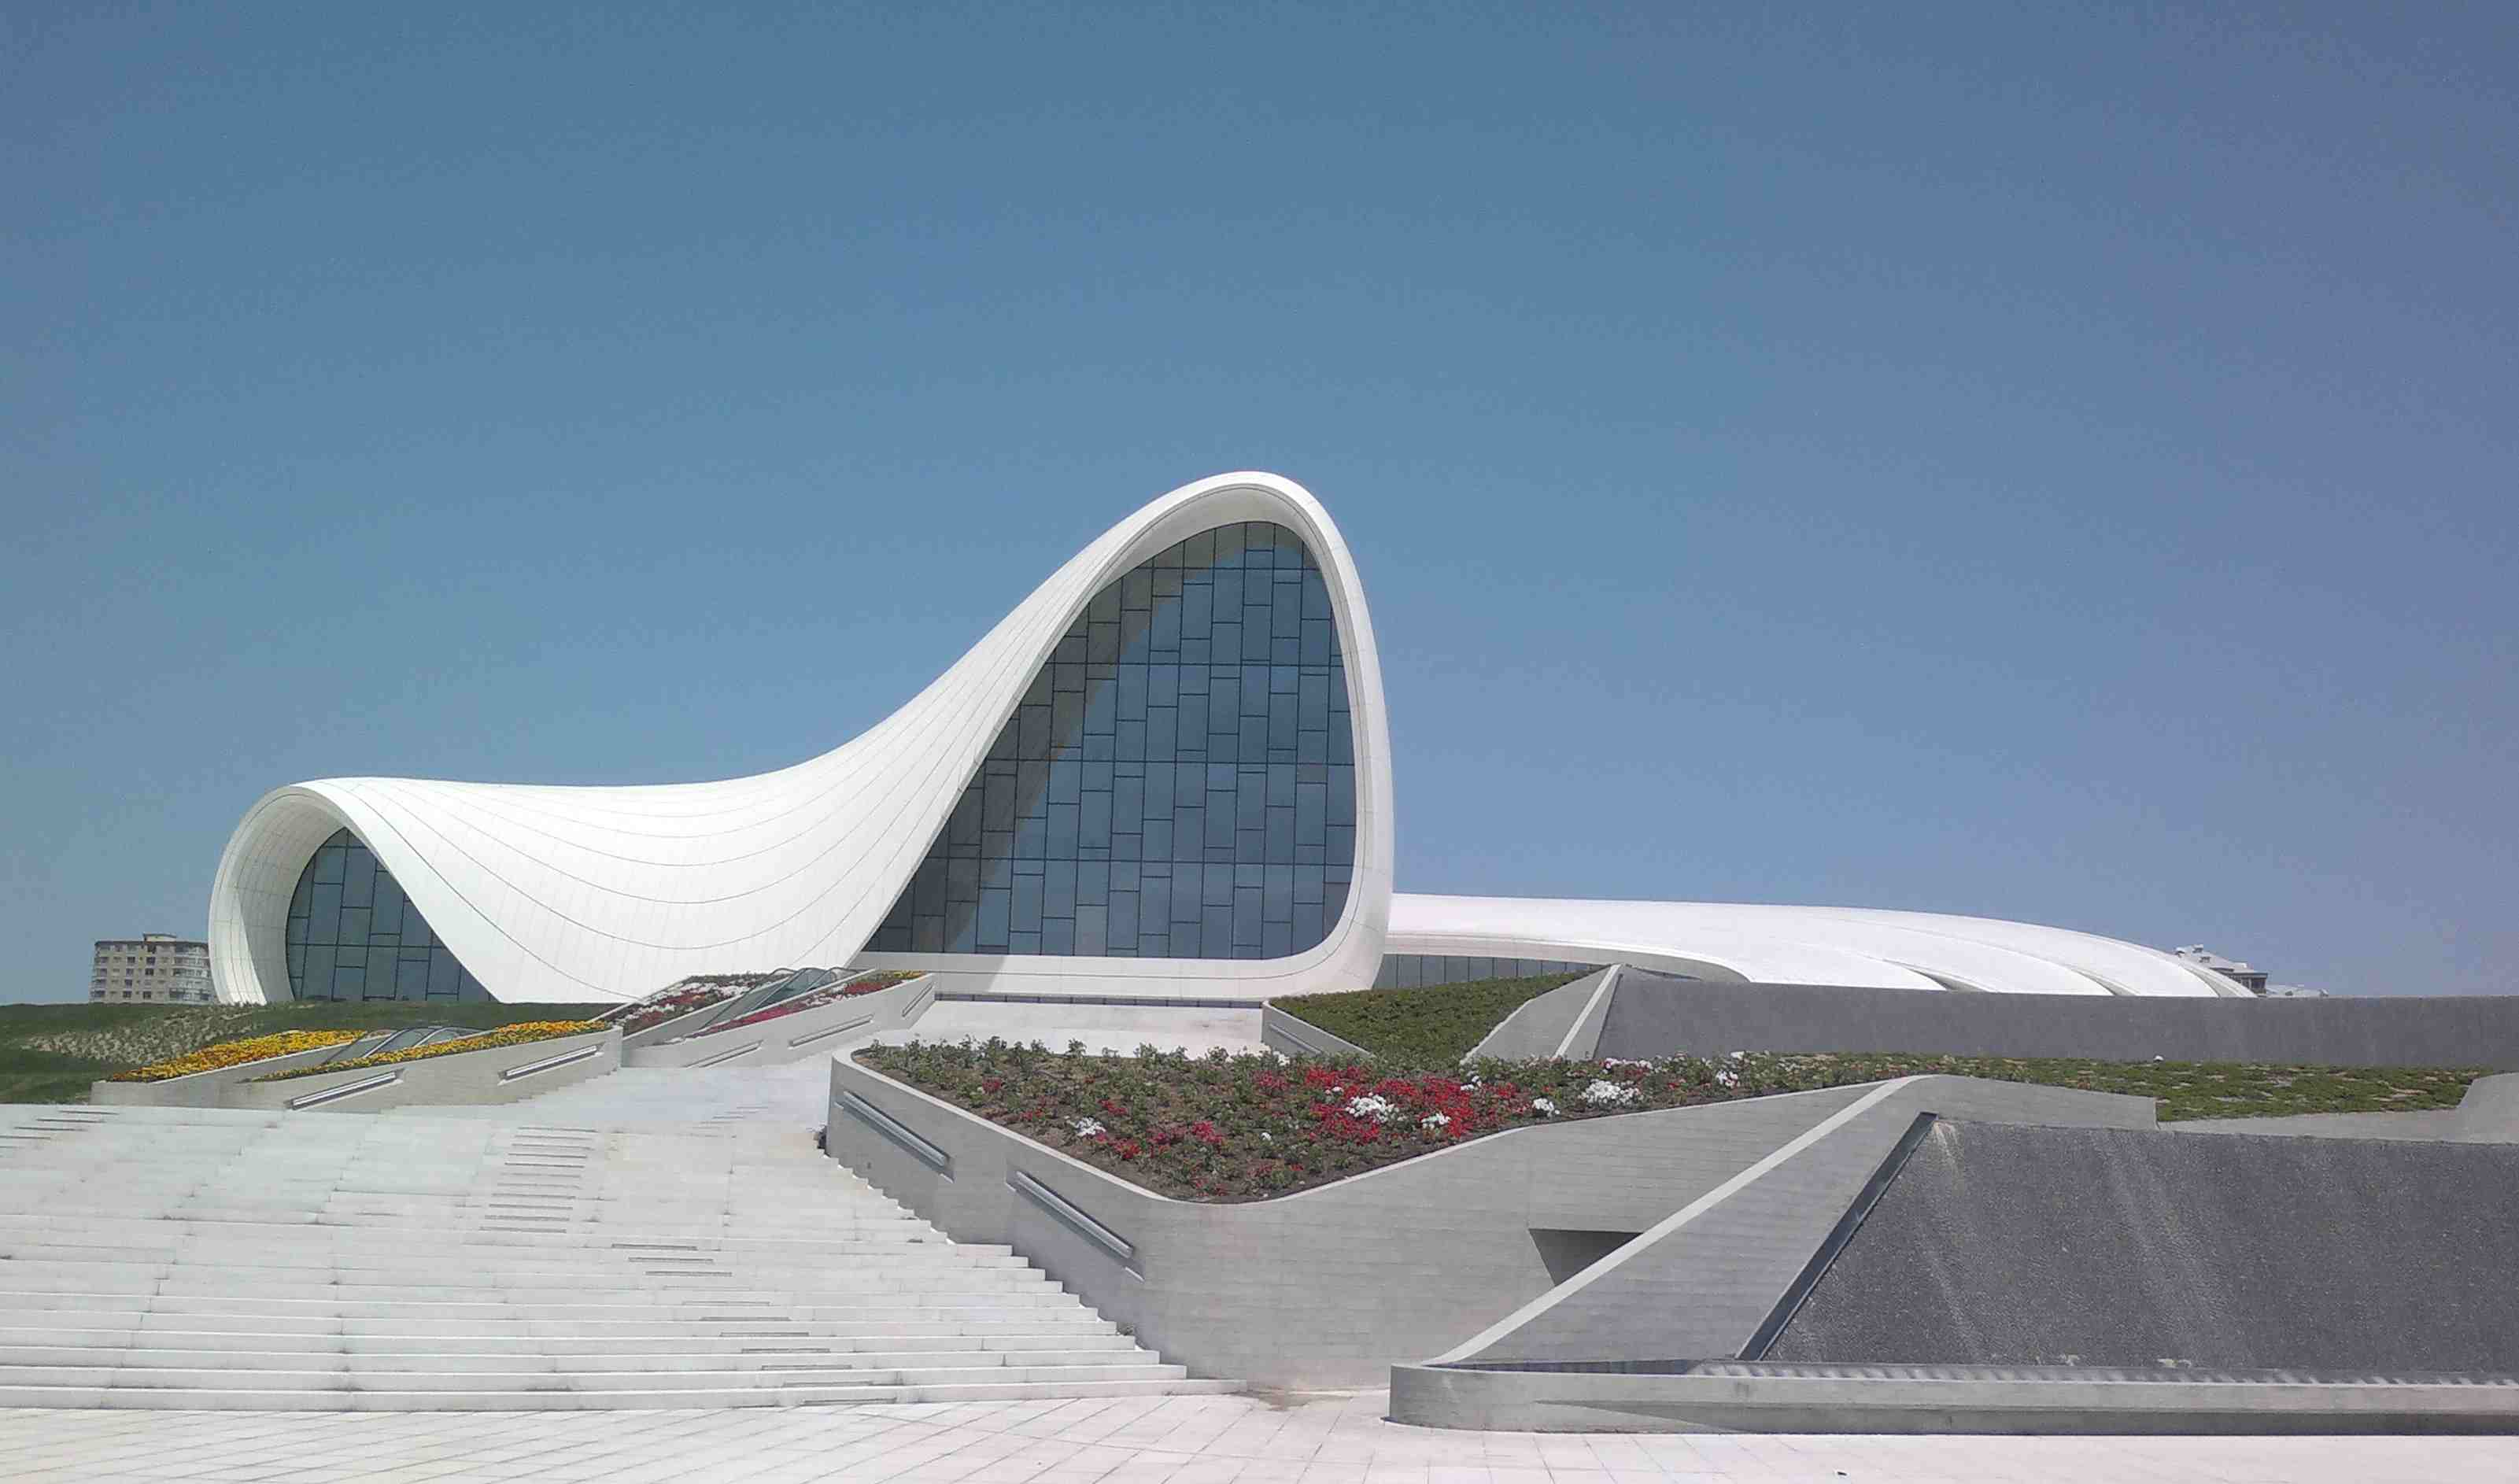 Zaha Hadid's museum design in Azerbaijan